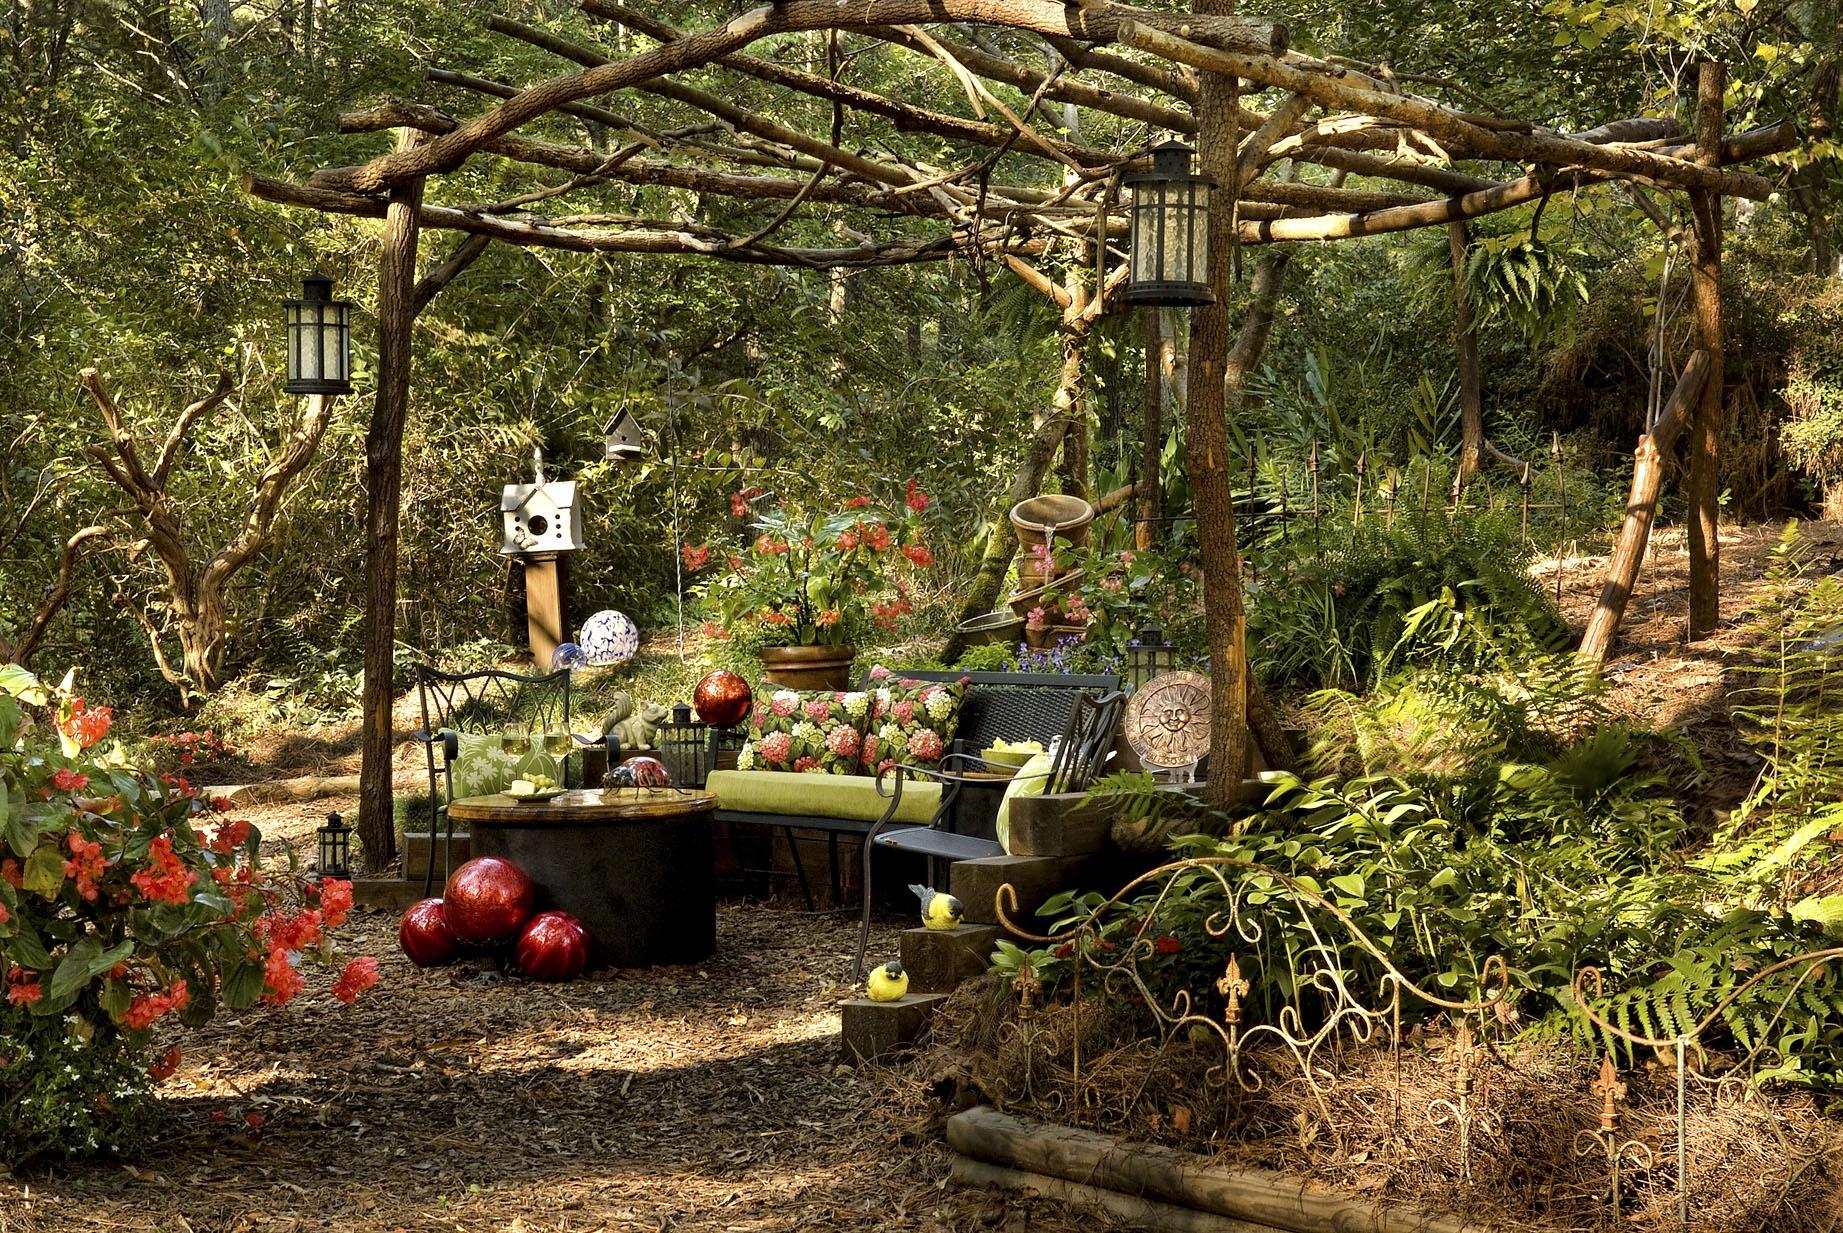 Backyard Transformation: From Wild Woods to Garden Dream ... on Dream Backyard Ideas id=61087